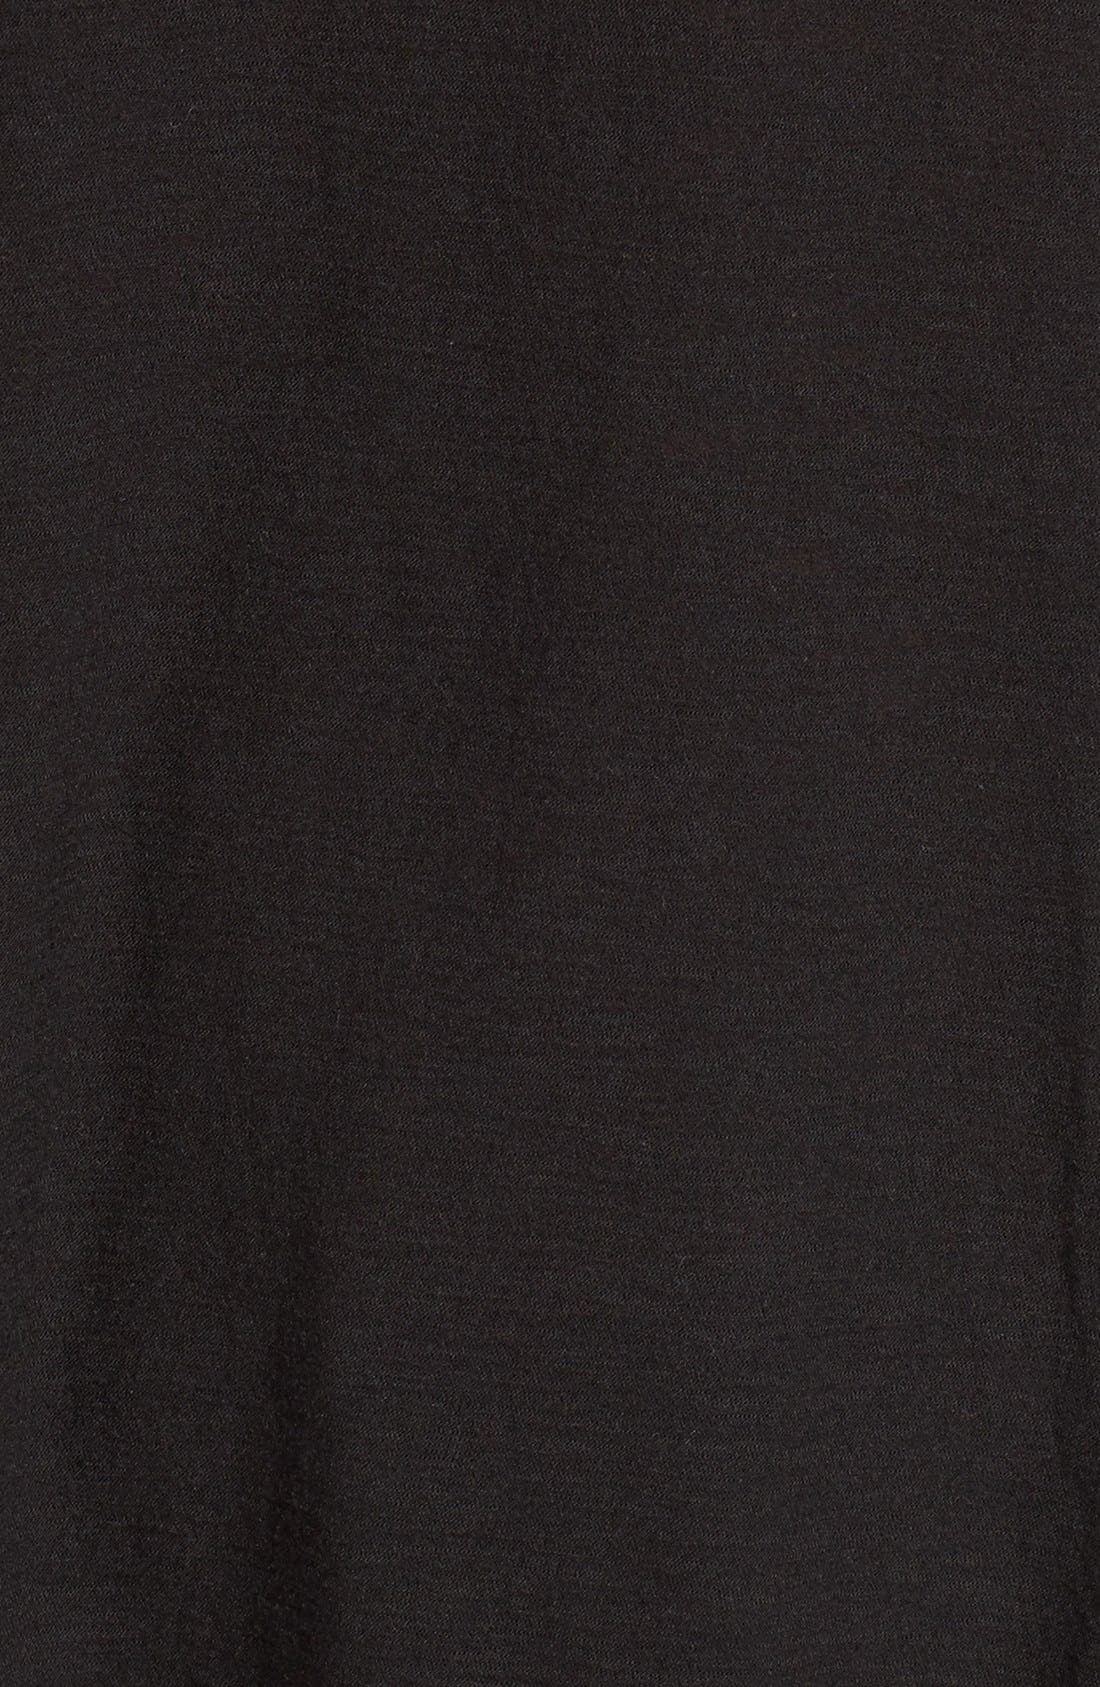 MICHELLE BY COMUNE, Knightsbridge Split Side Tunic, Alternate thumbnail 5, color, 001